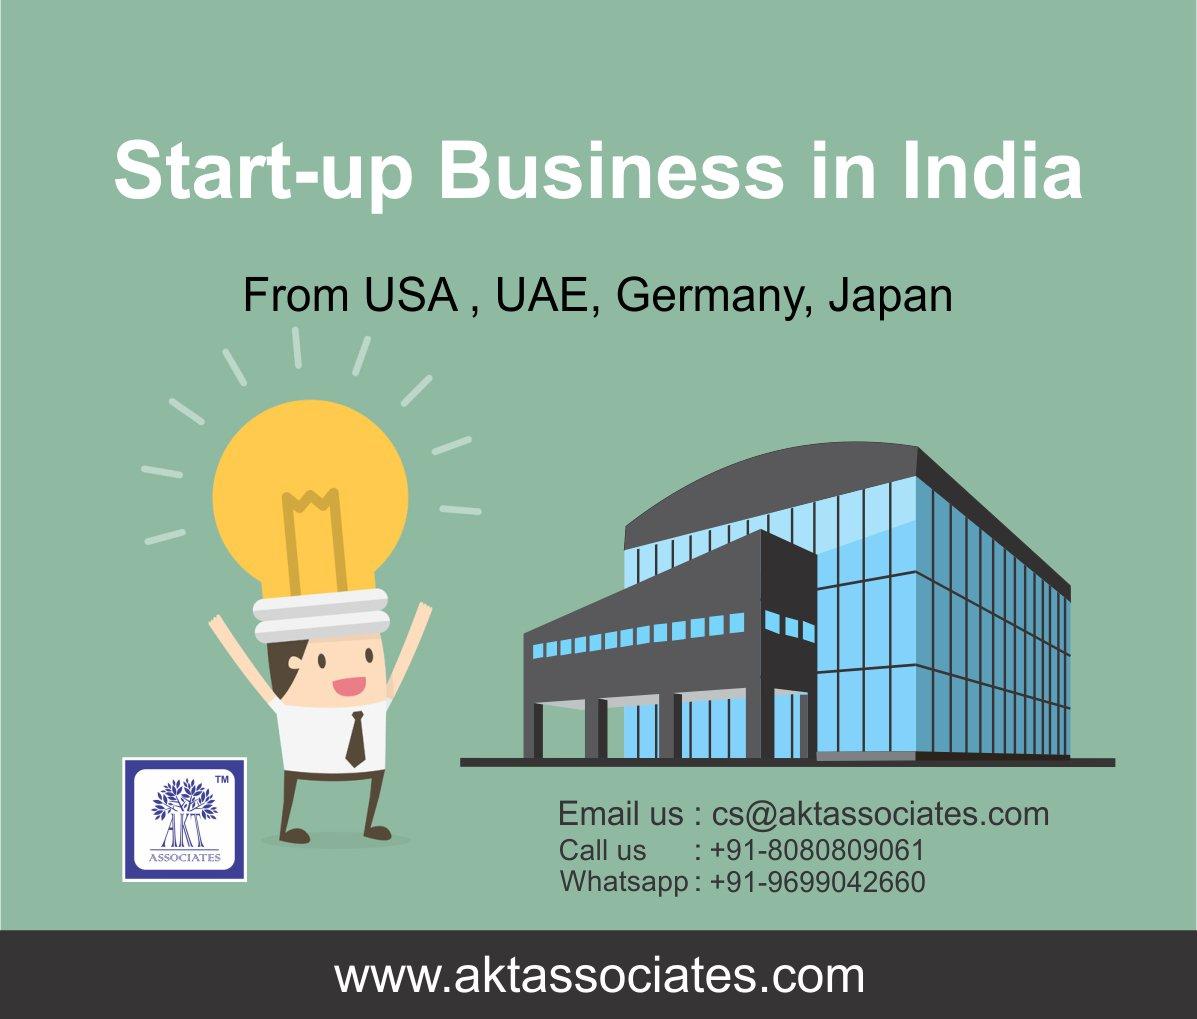 startingbusinessindia hashtag on Twitter